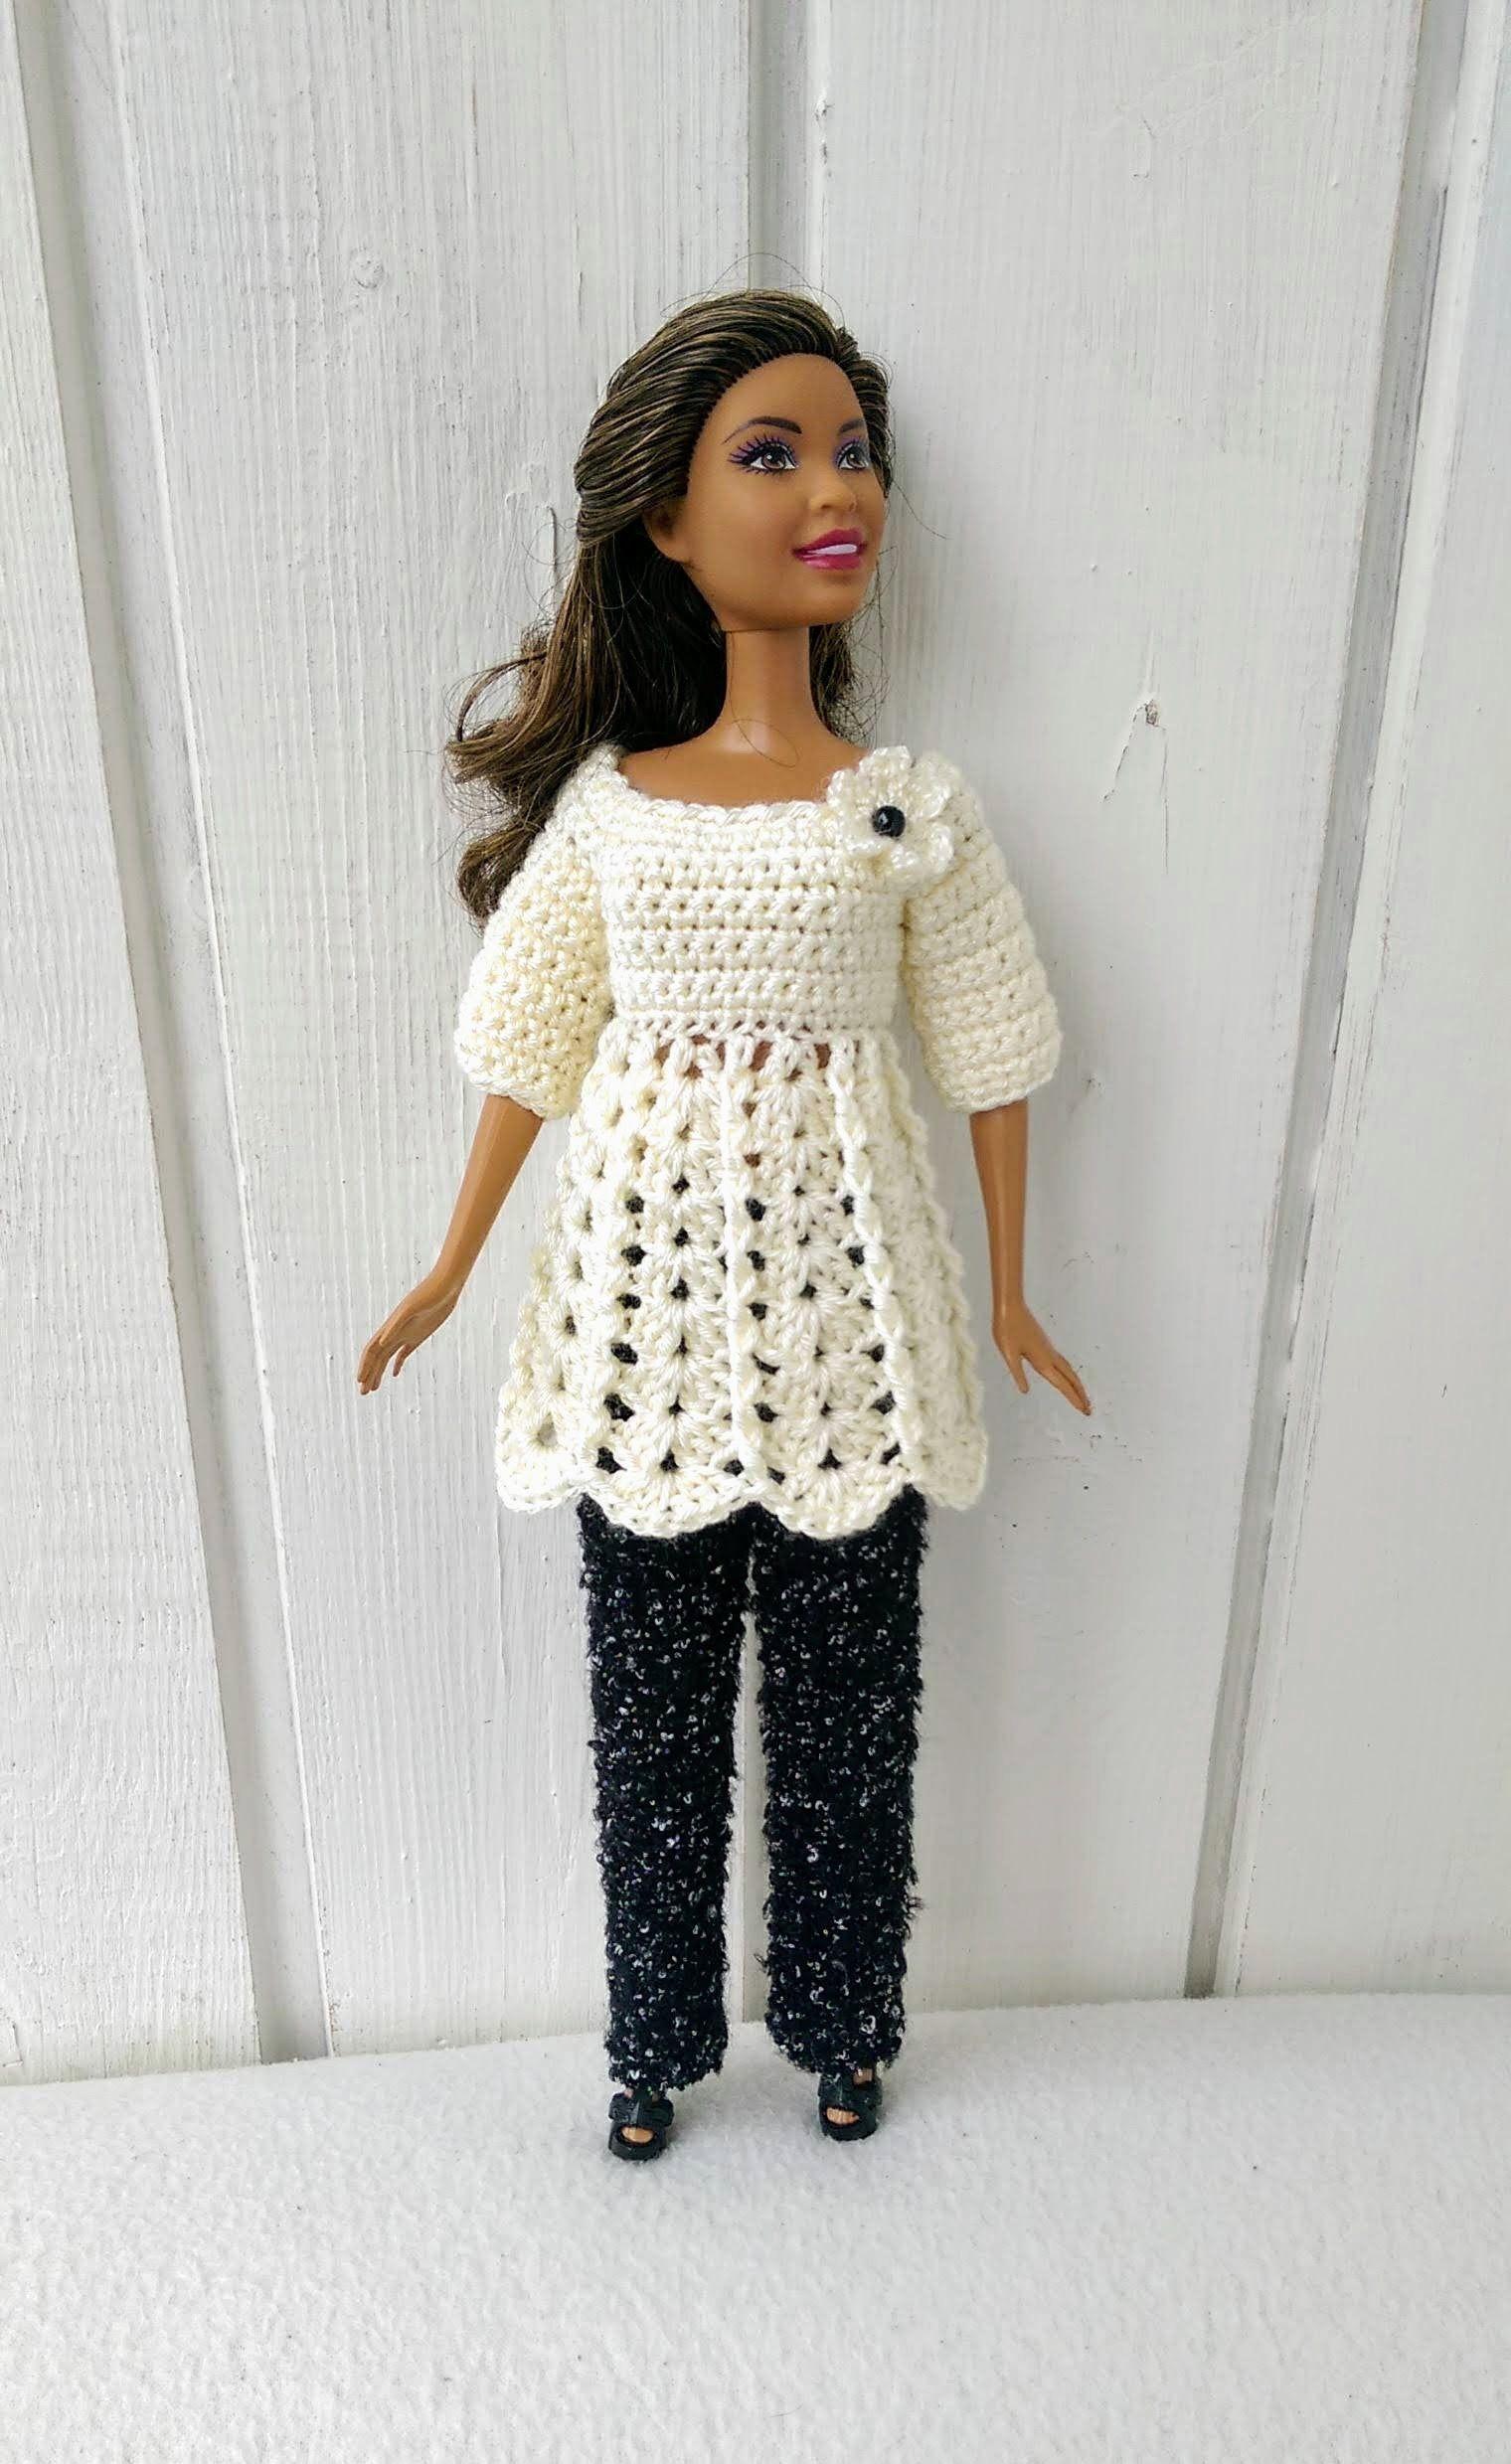 Best Doll Free Crochet Patterns | Knitted doll patterns, Crochet ... | 2479x1520